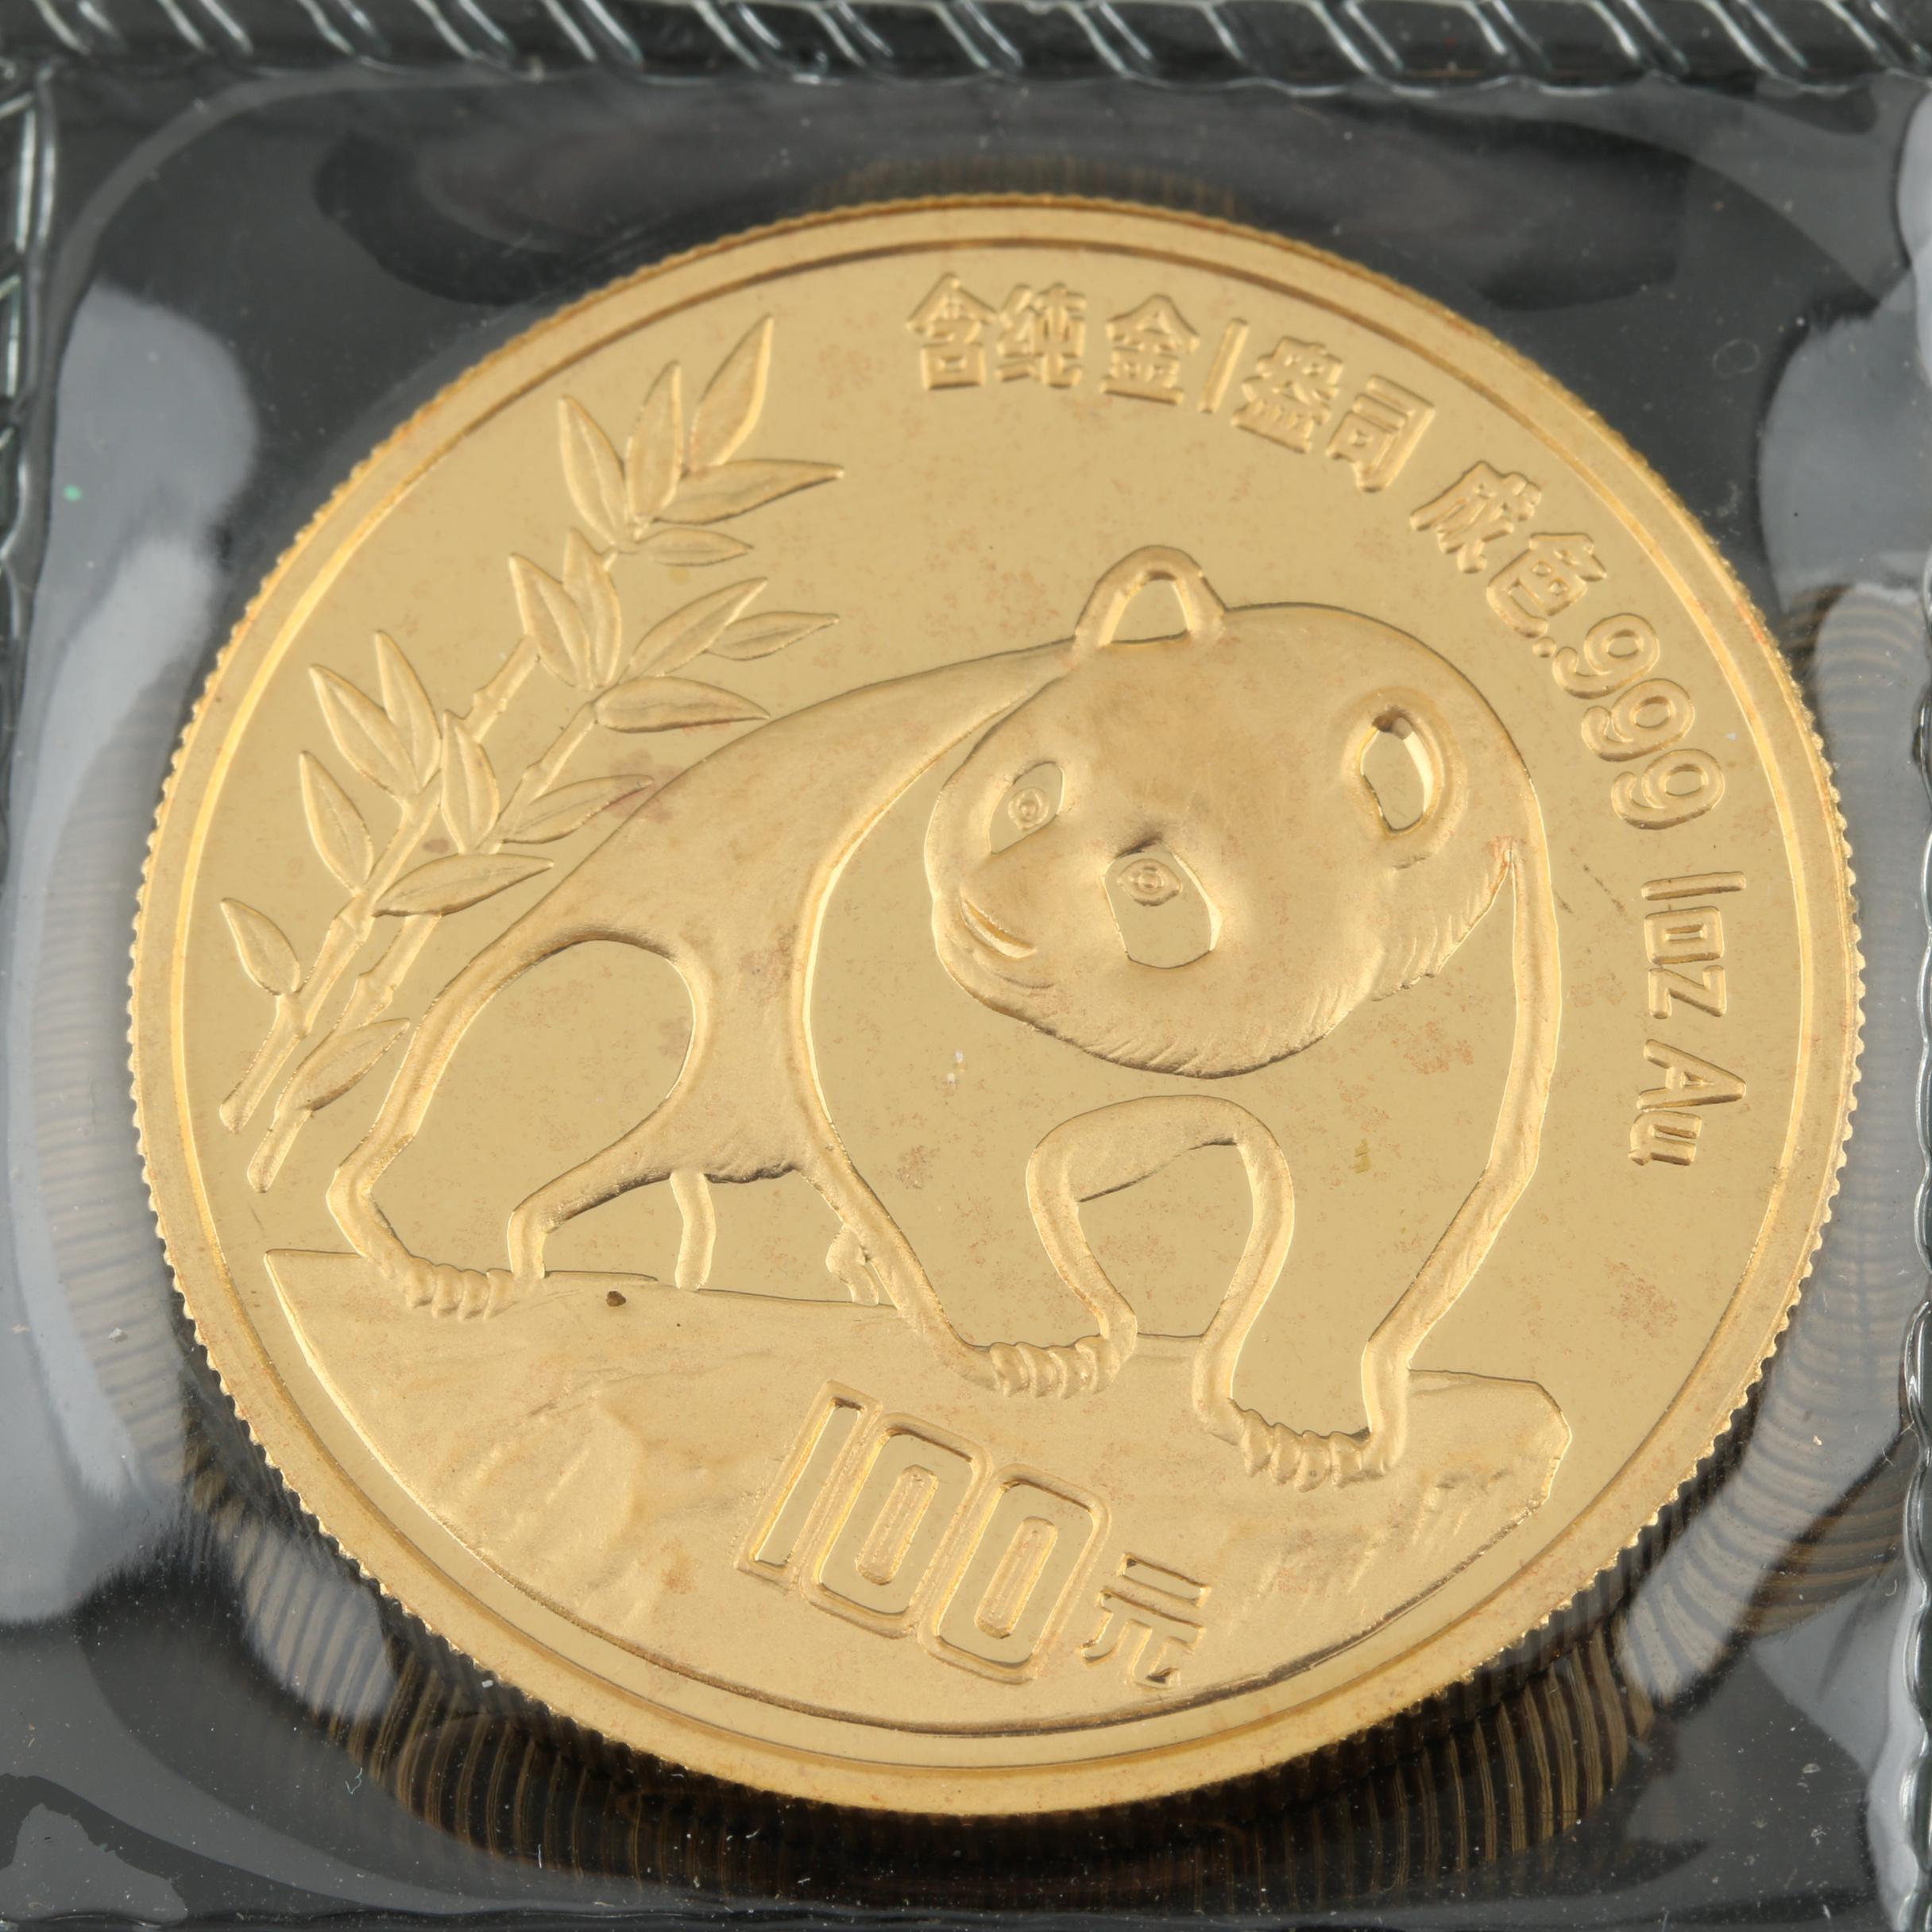 1990 100 Yuan Chinese 1 Oz. Gold Panda